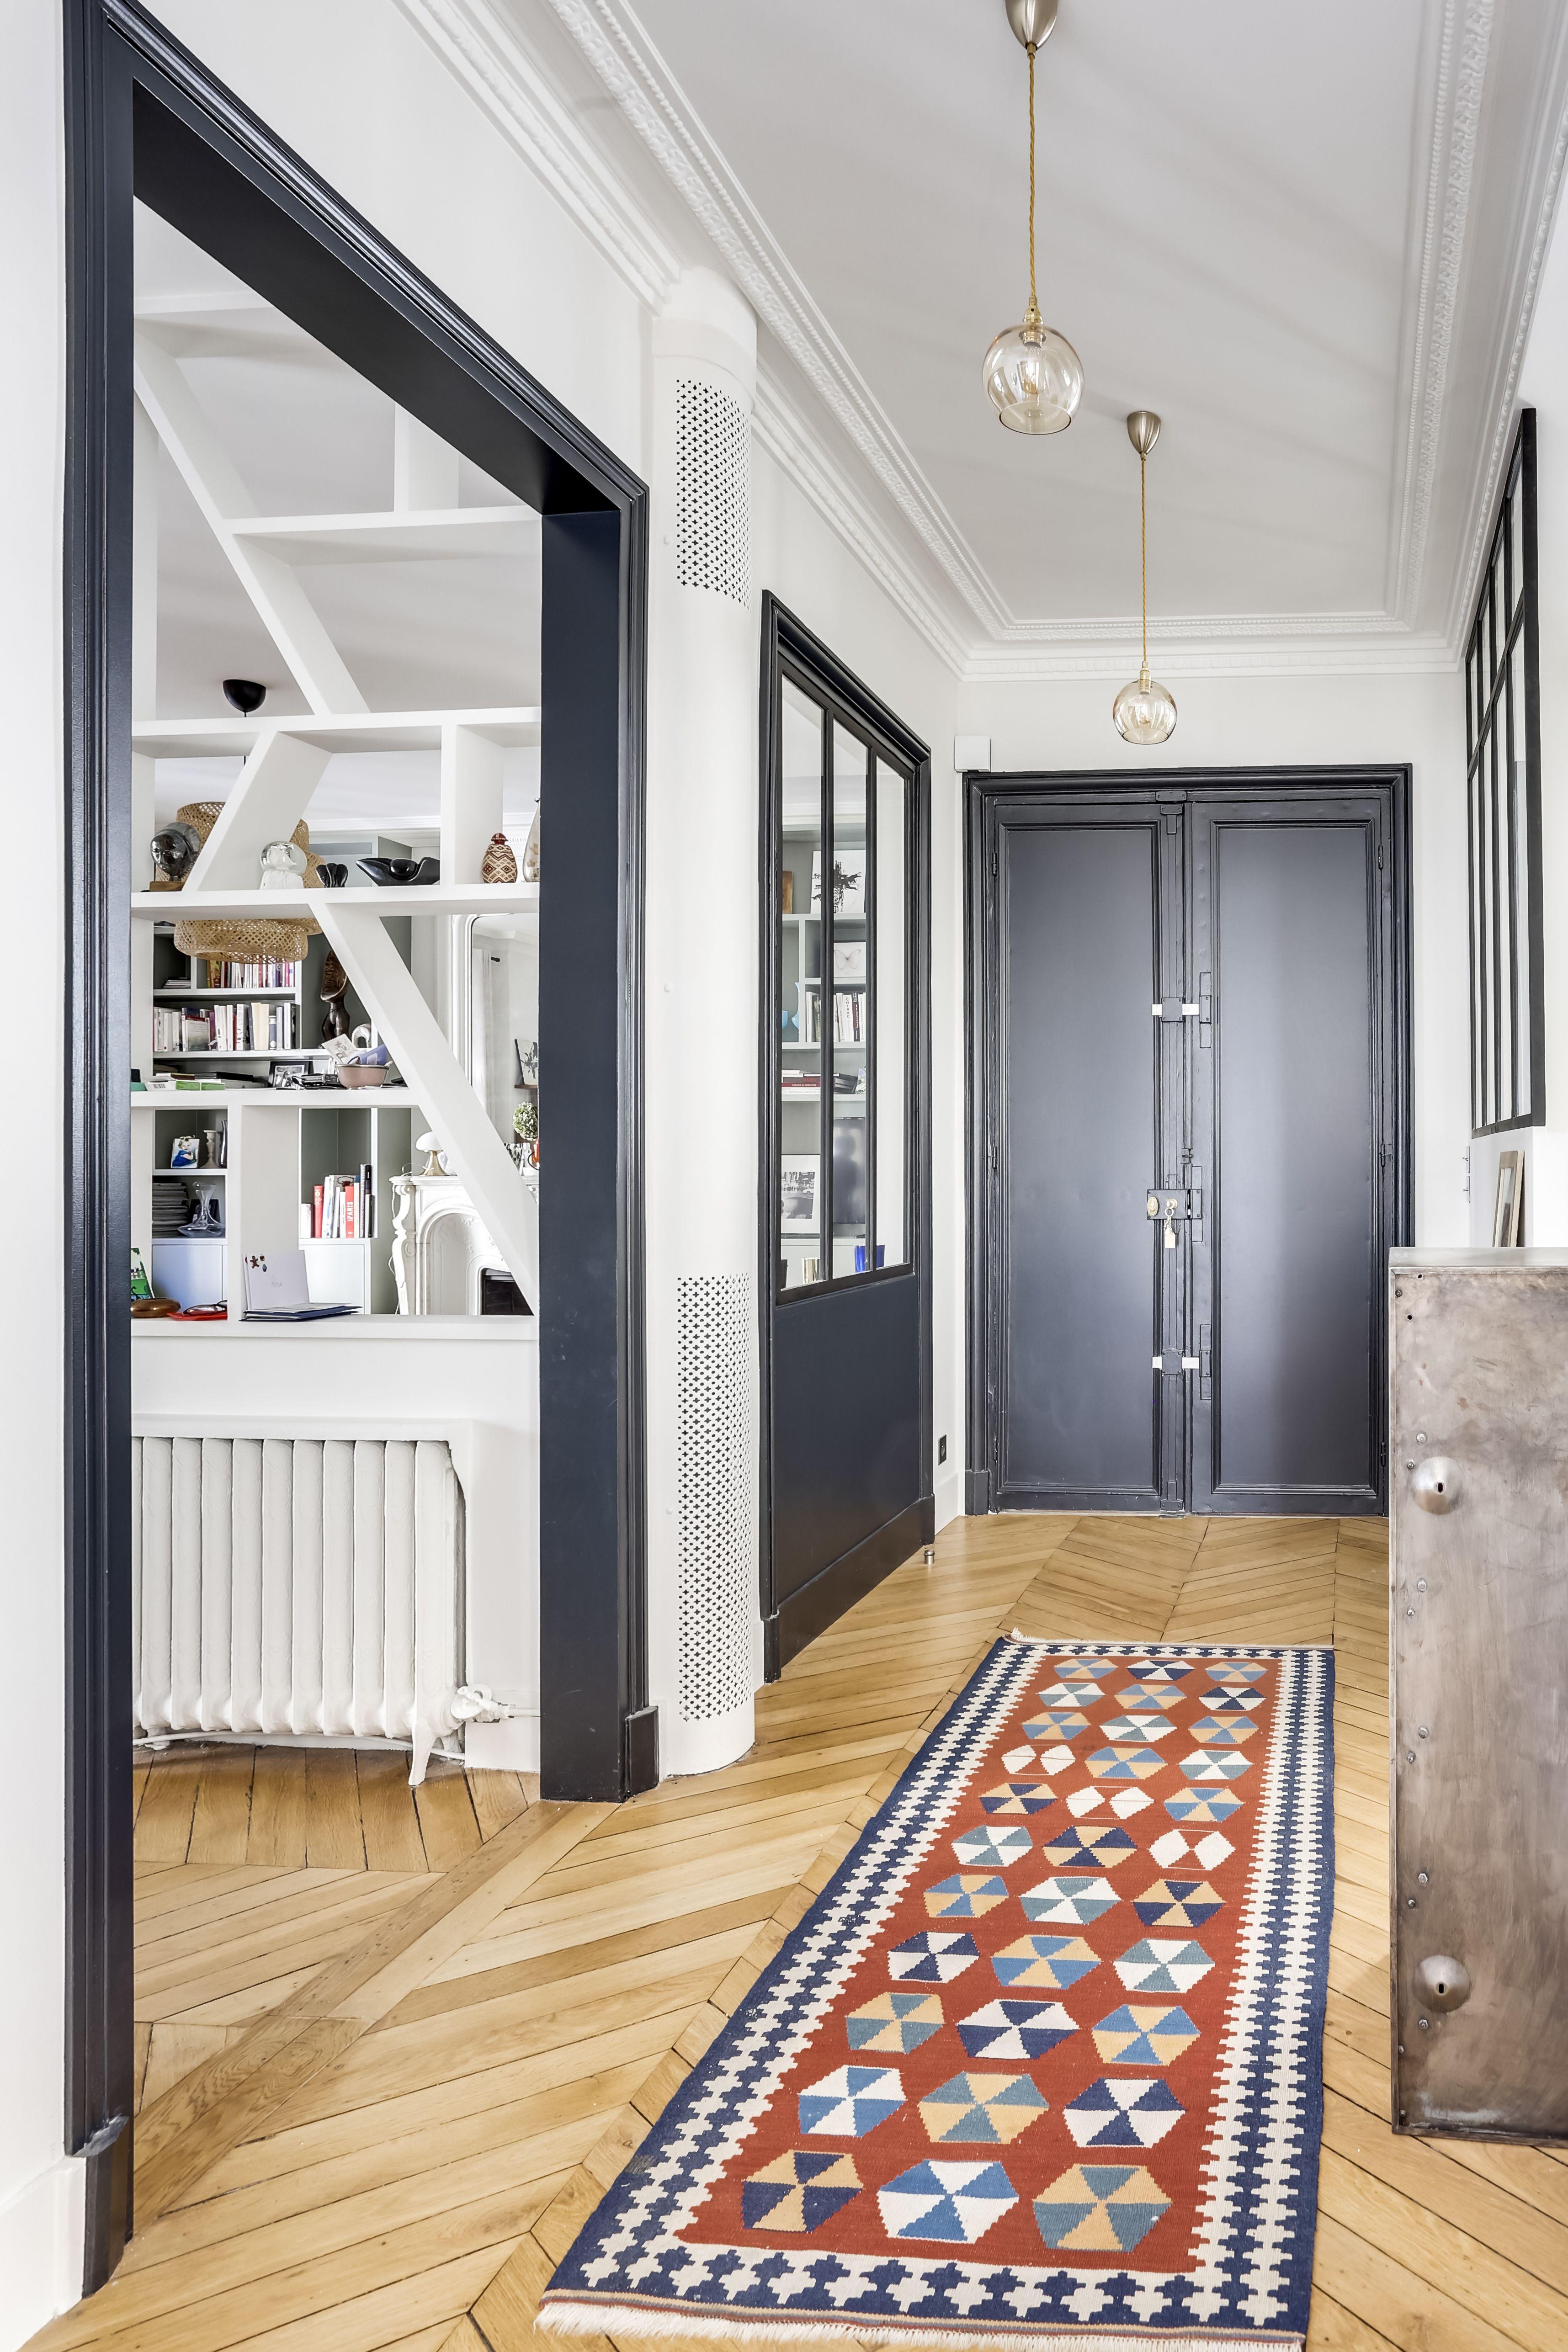 projet f porte et contour portes. Black Bedroom Furniture Sets. Home Design Ideas